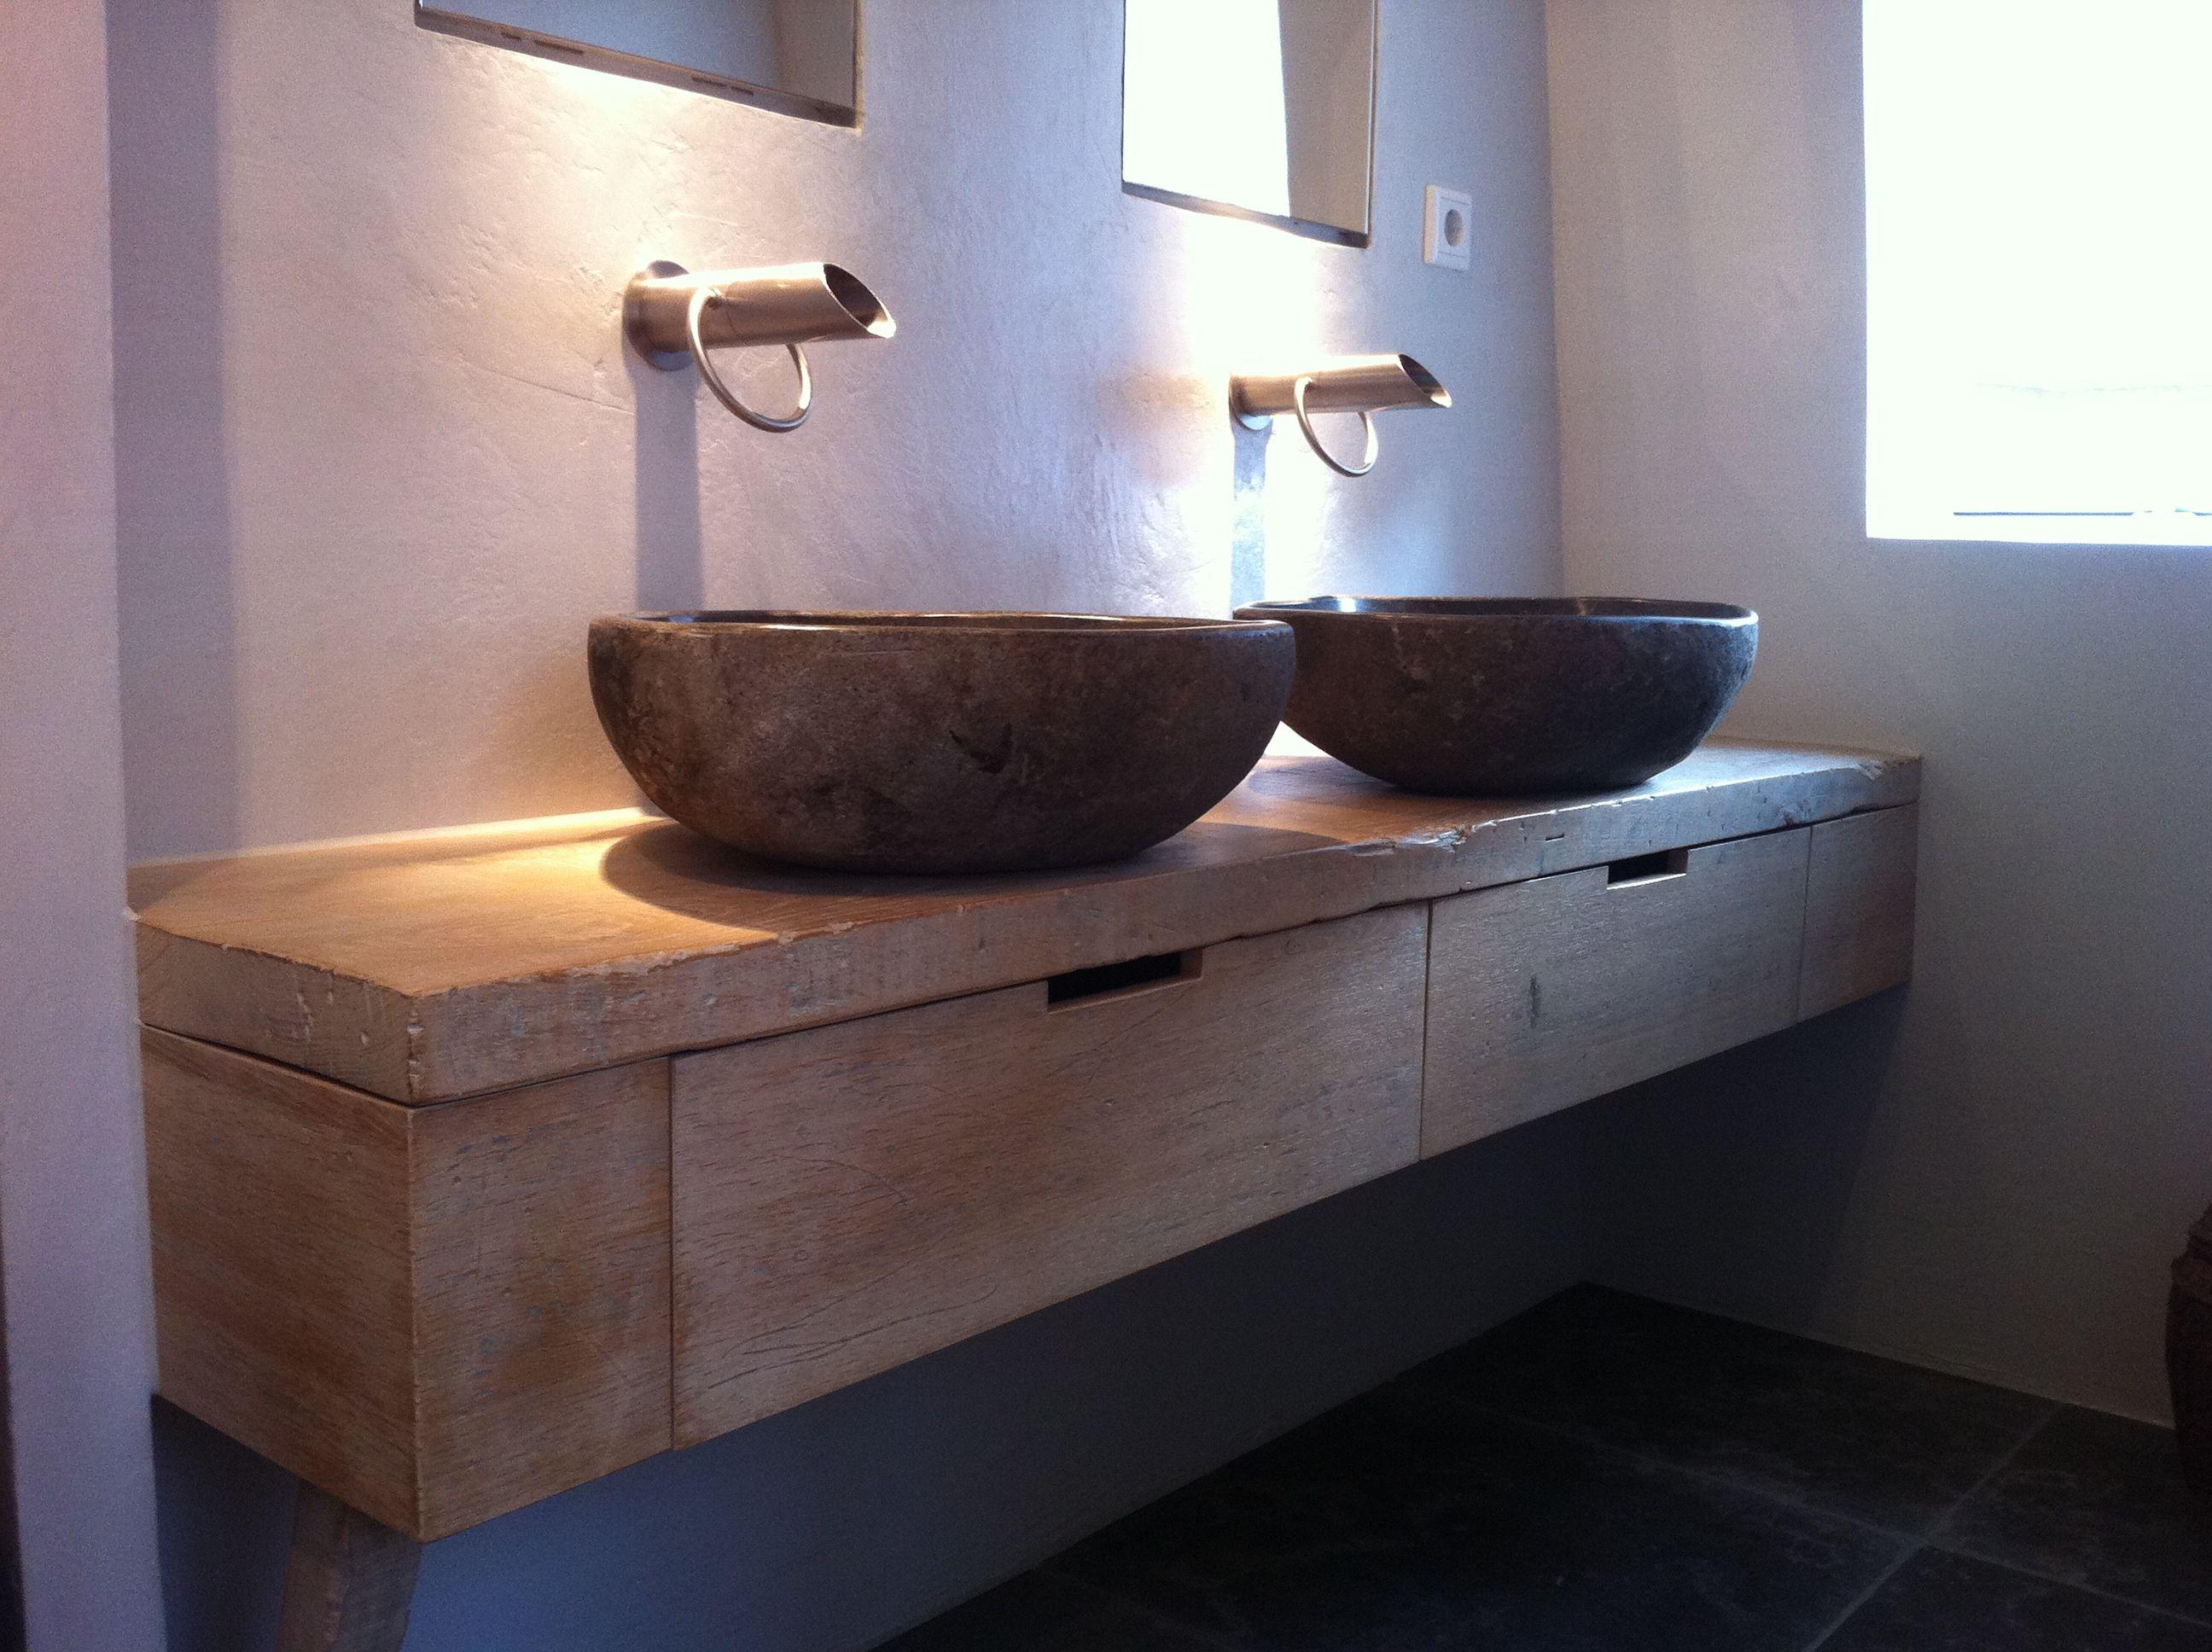 Zwevend oud eiken meubel met kraan pure en wasbak rots by natural